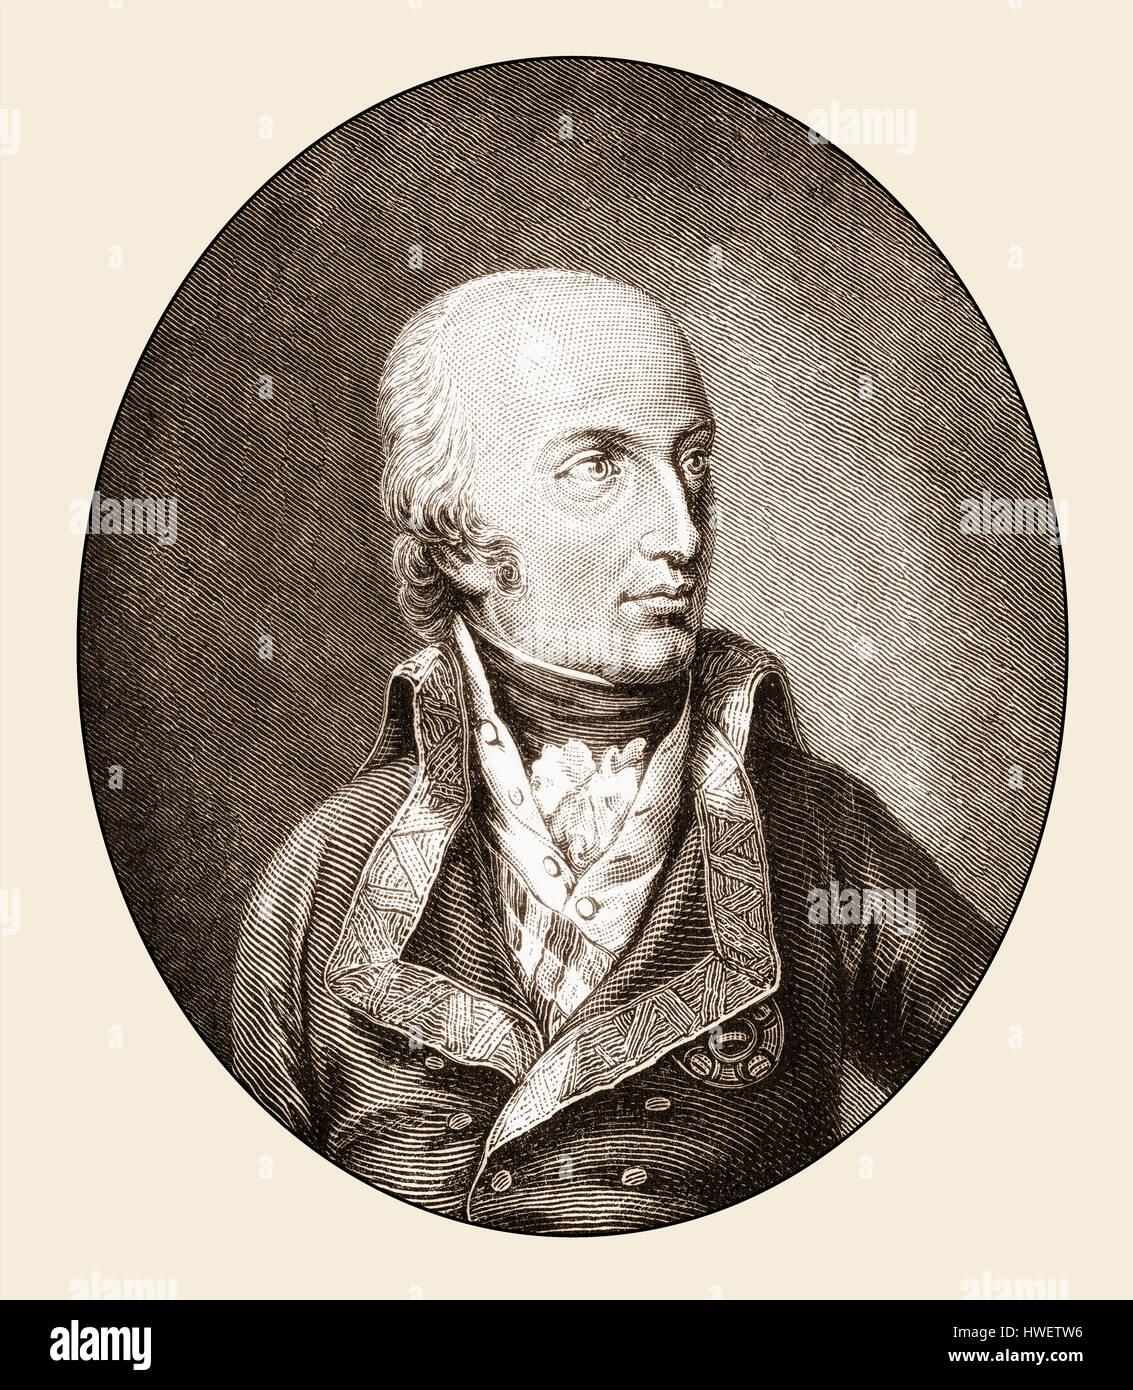 Carl Ludwig Johann Joseph Laurentius of Austria, Duke of Teschen, 1771 - 1847, an Austrian commander of the House - Stock Image